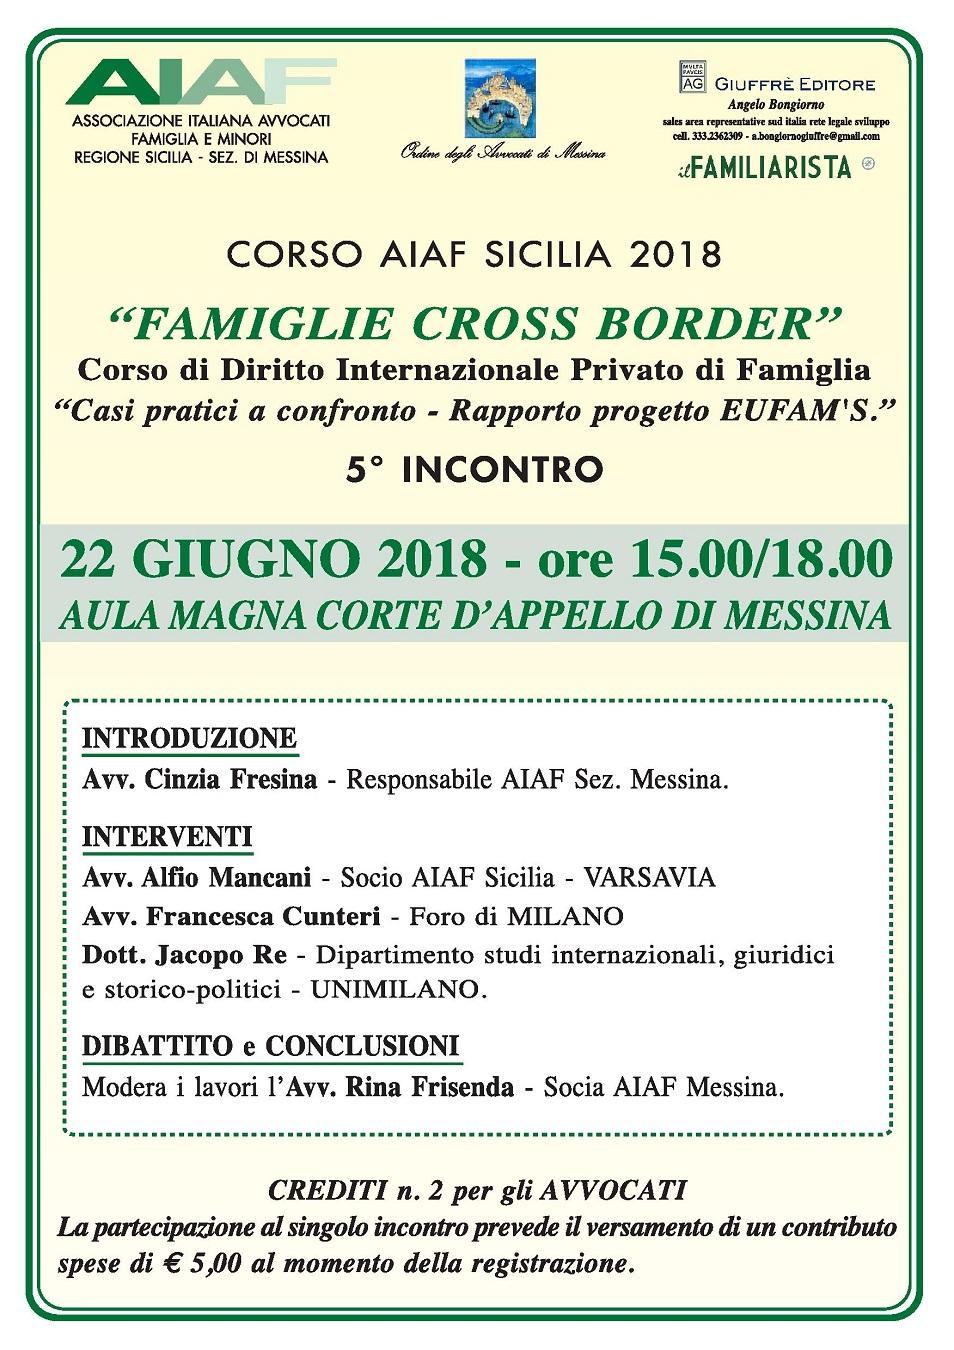 Corso AIAF Sicilia